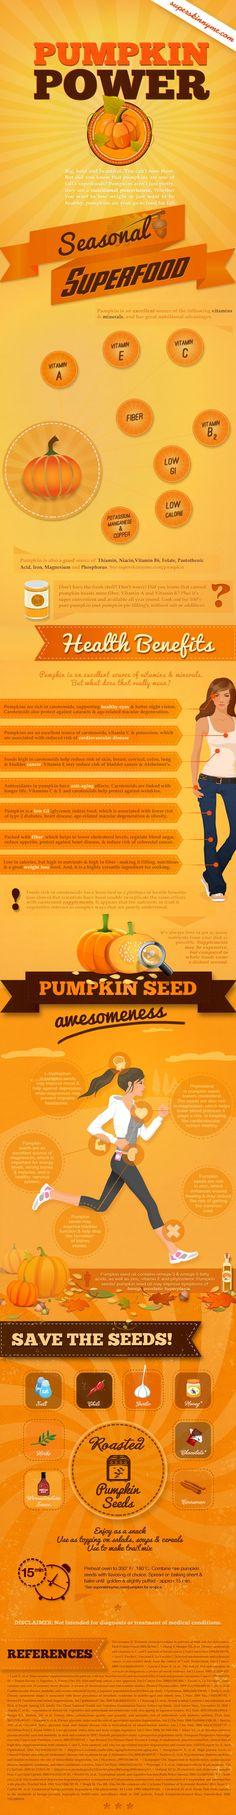 The Health Benefits of #Pumpkin Seeds #health